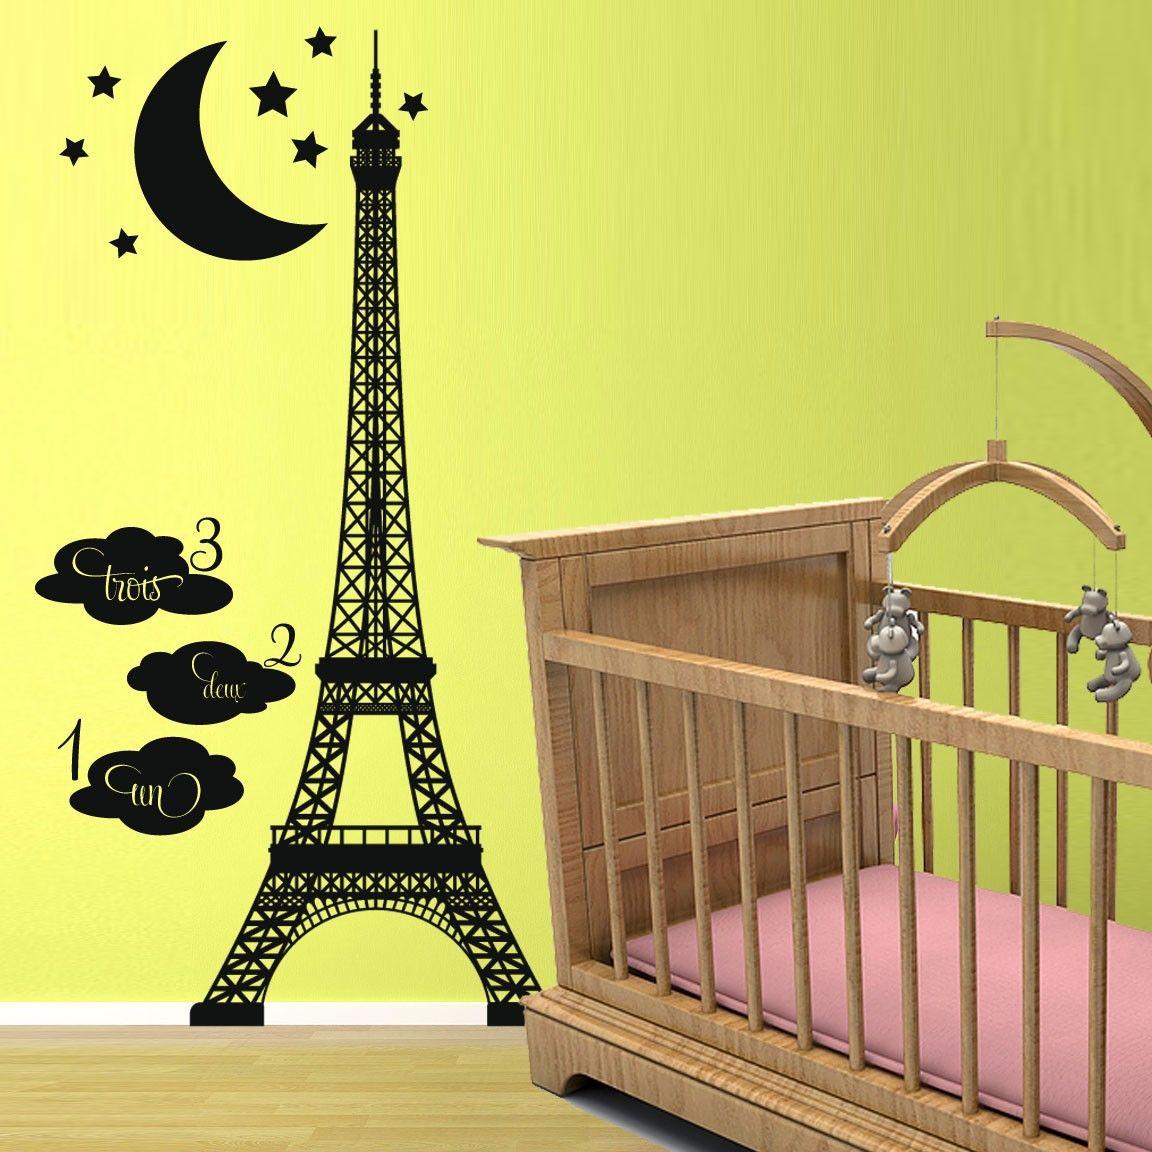 Vinyl Wall Decal Sticker Art -Eiffel Tower Growth Chart | Bedrooms ...